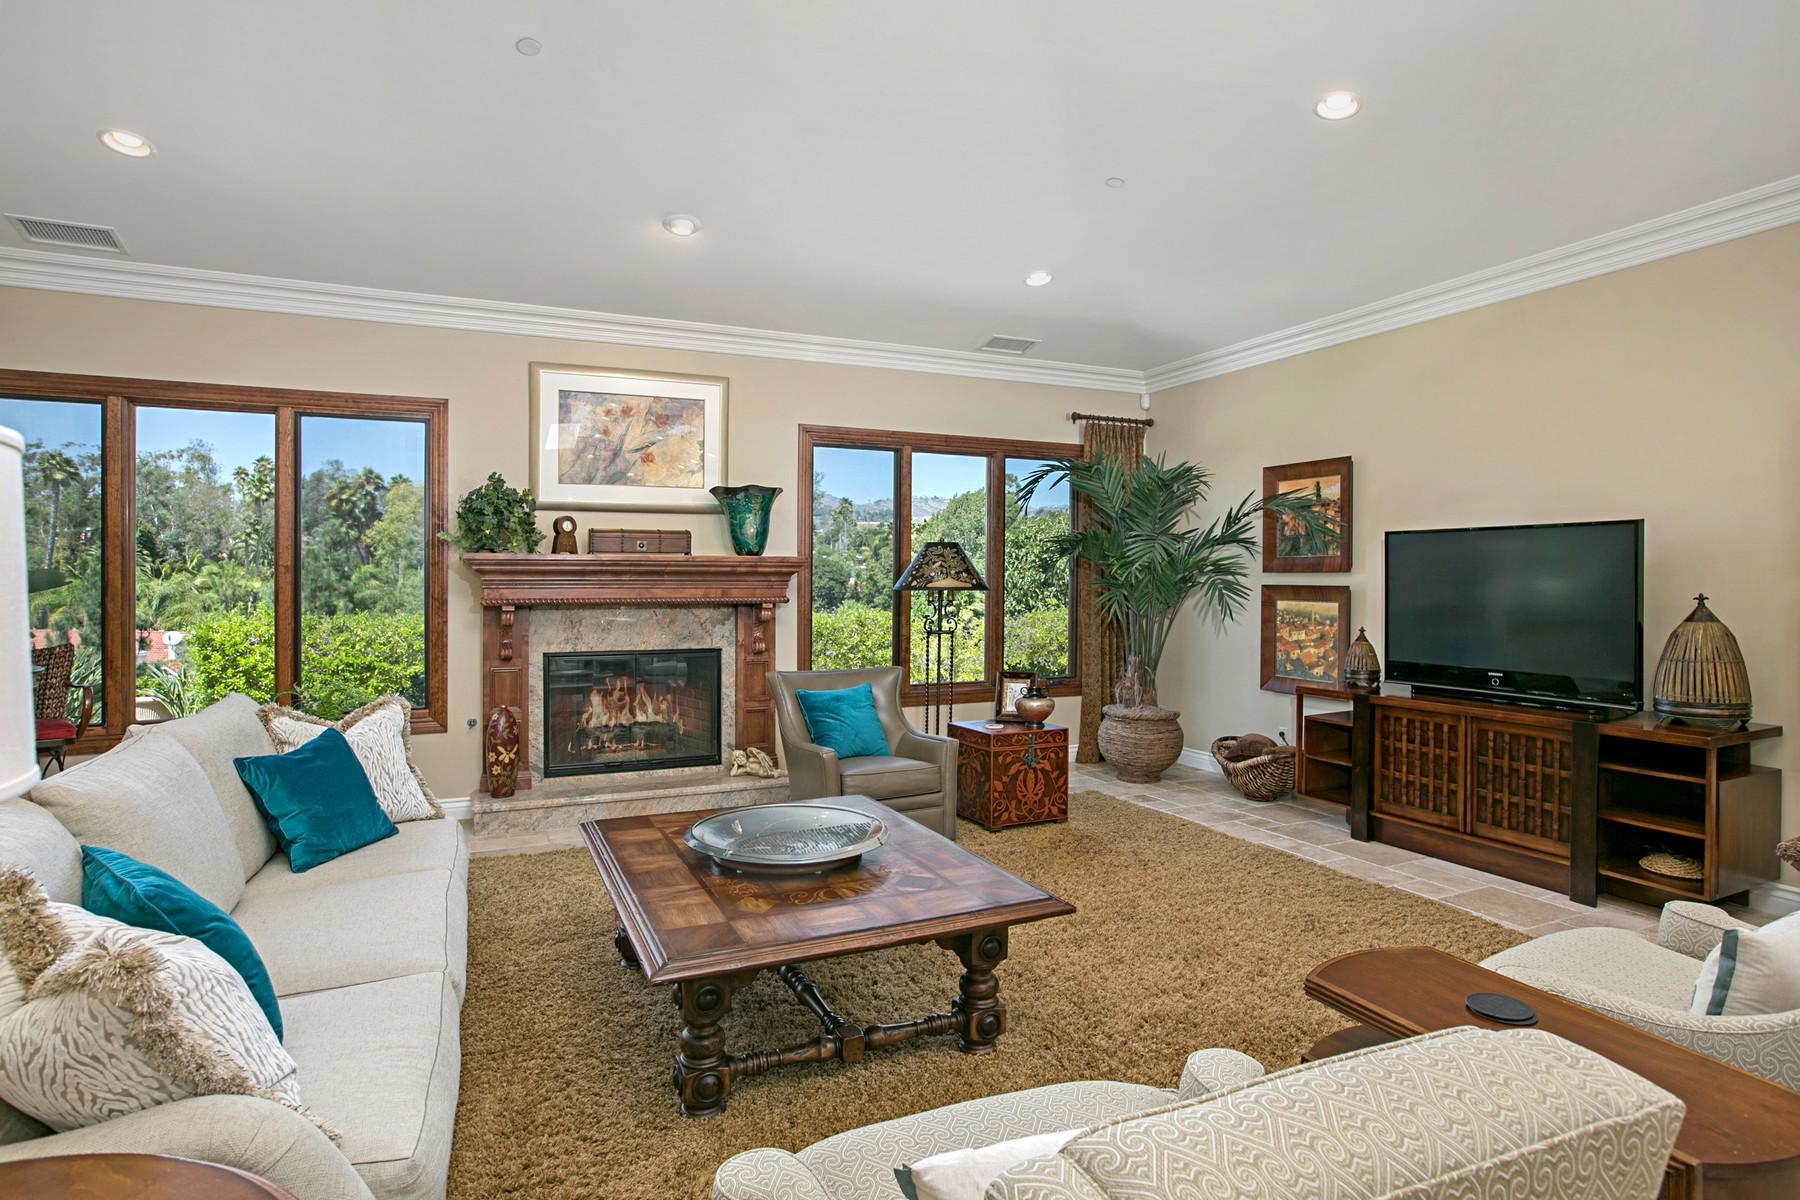 Additional photo for property listing at 17206 El Caporal  Rancho Santa Fe, California 92067 Estados Unidos